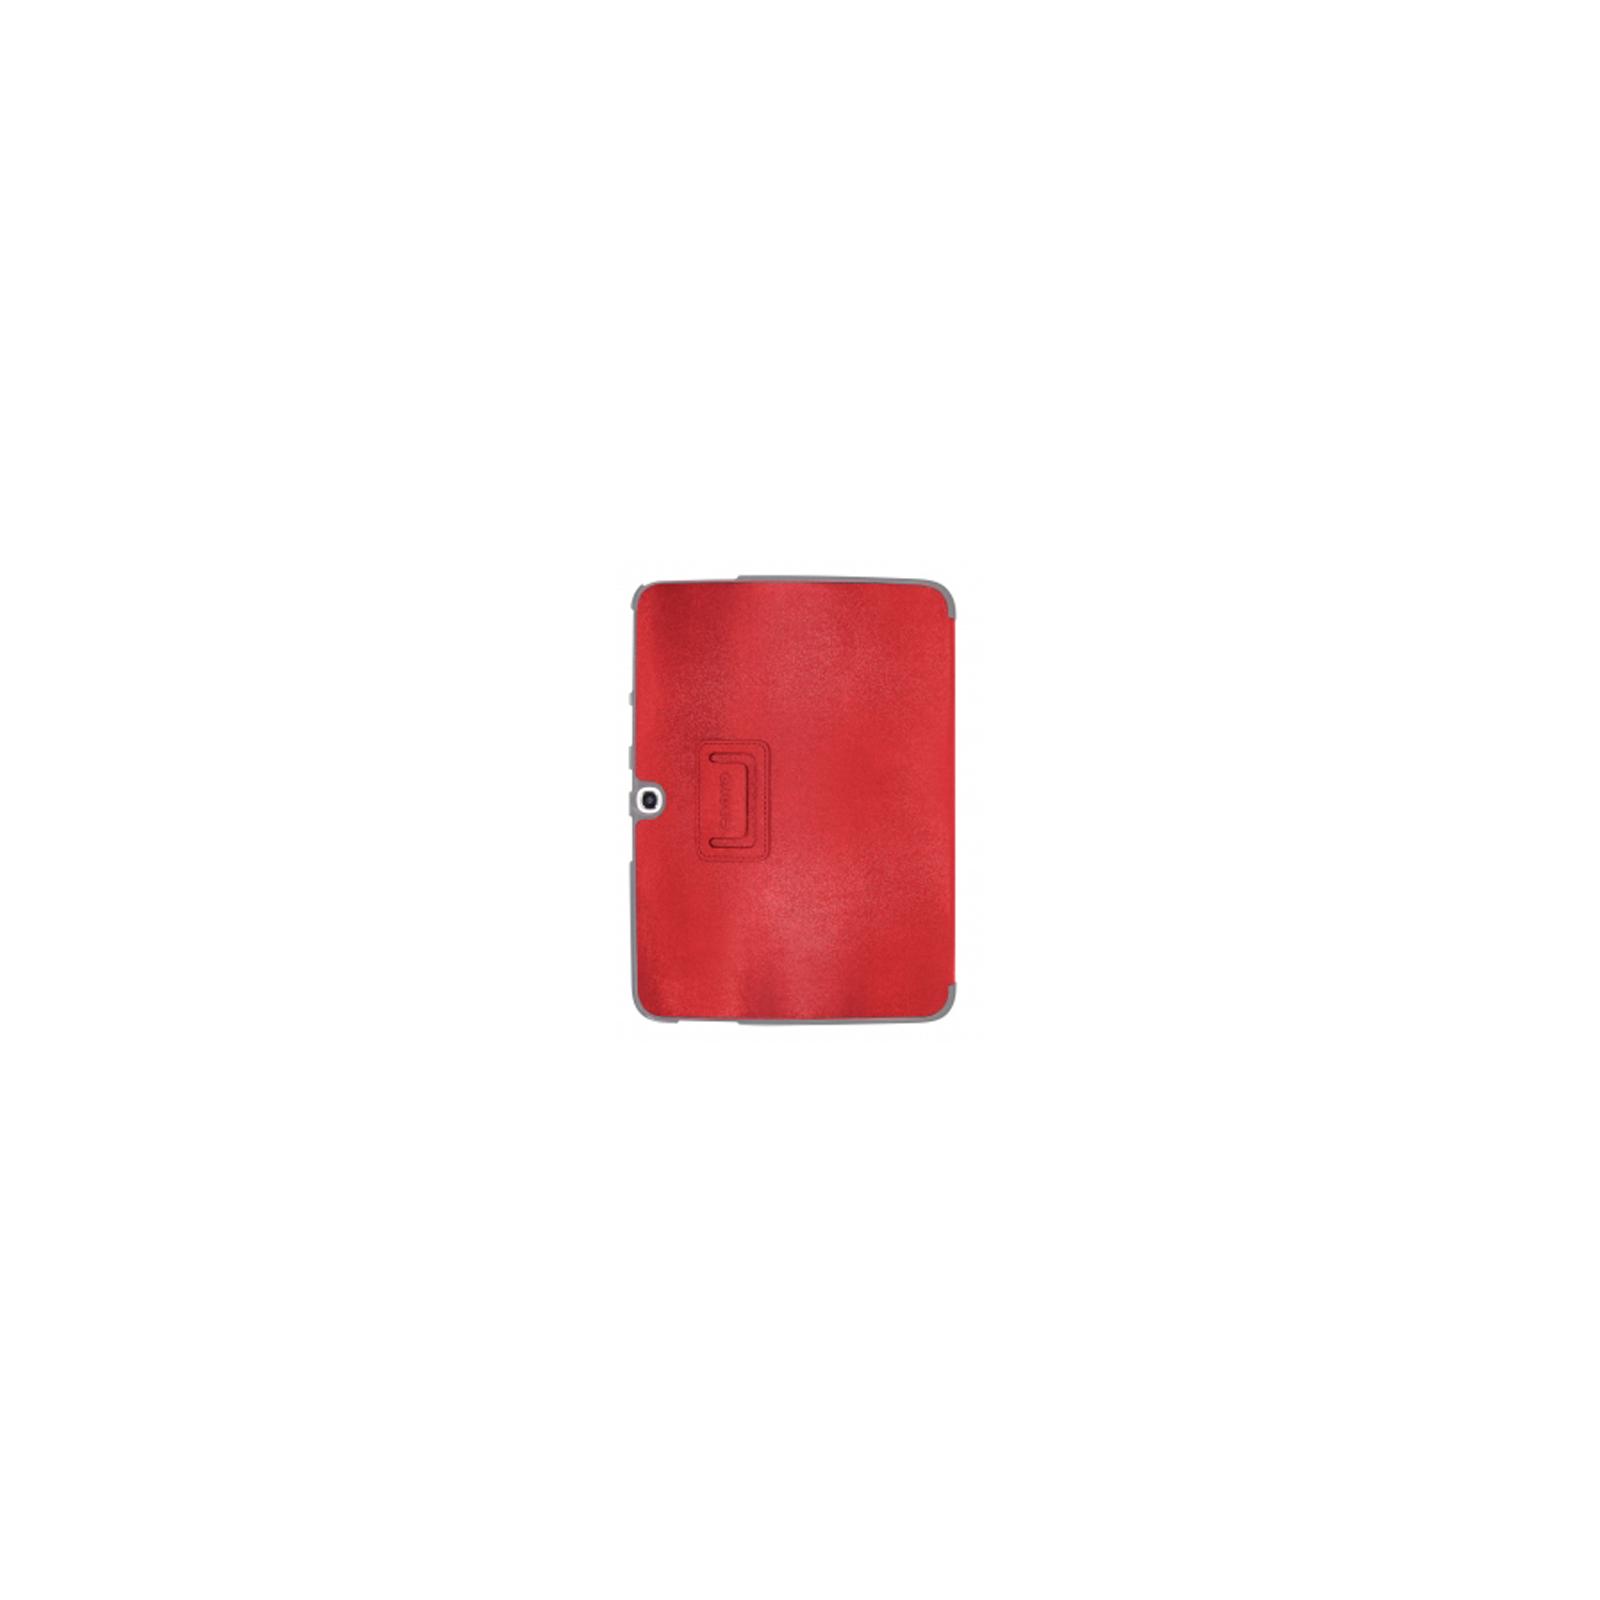 Чехол для планшета ODOYO Galaxy TAB3 10.1 /GLITZ COAT FOLIO BLAZING RED (PH625RD) изображение 2